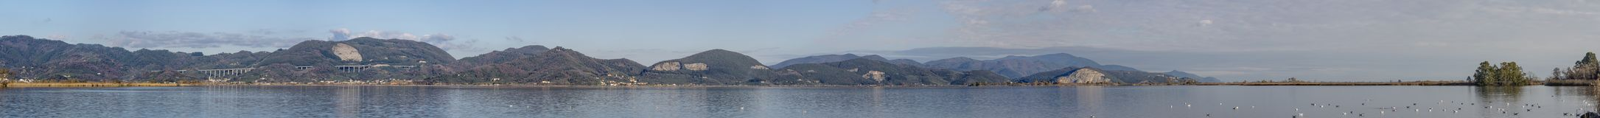 Панорамный взгляд озера Massaciuccoli от Torre del Lago Puccini, Лукки, Тосканы, Италии стоковые изображения